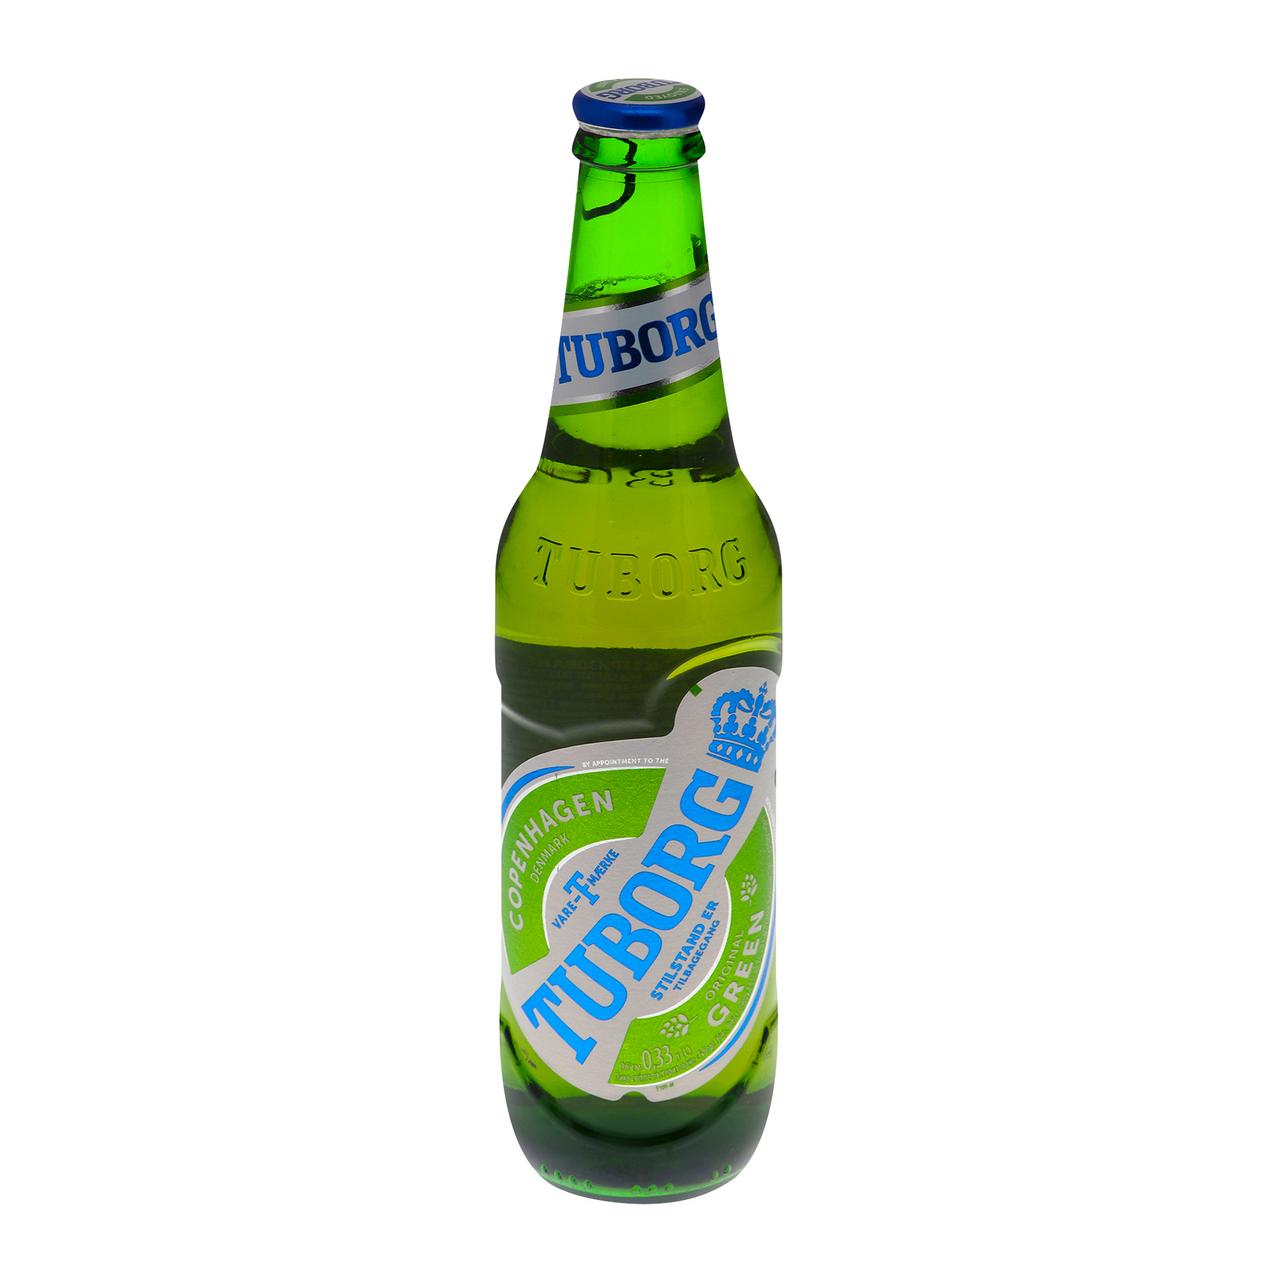 Пиво Tuborg Green світле пастеризоване 4.6% 0.33л